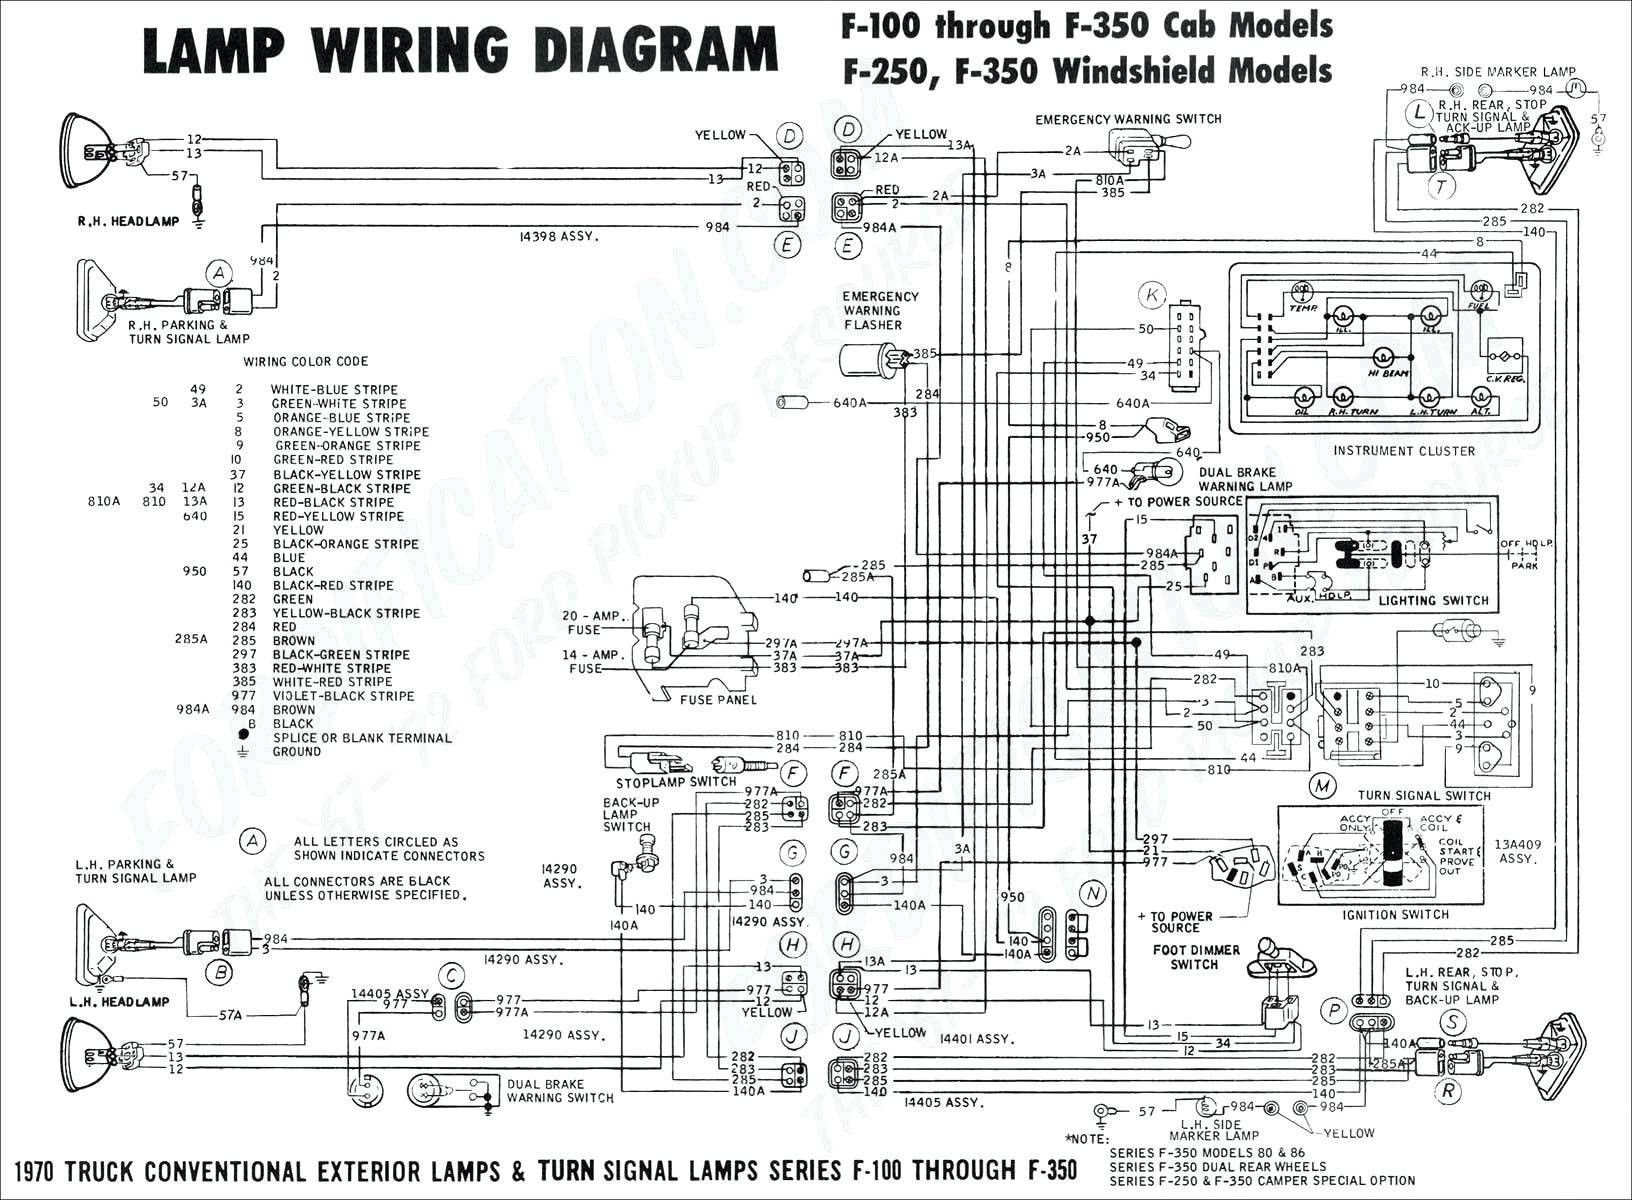 2007 Dodge Ram 1500 Ignition Switch Wiring Diagram